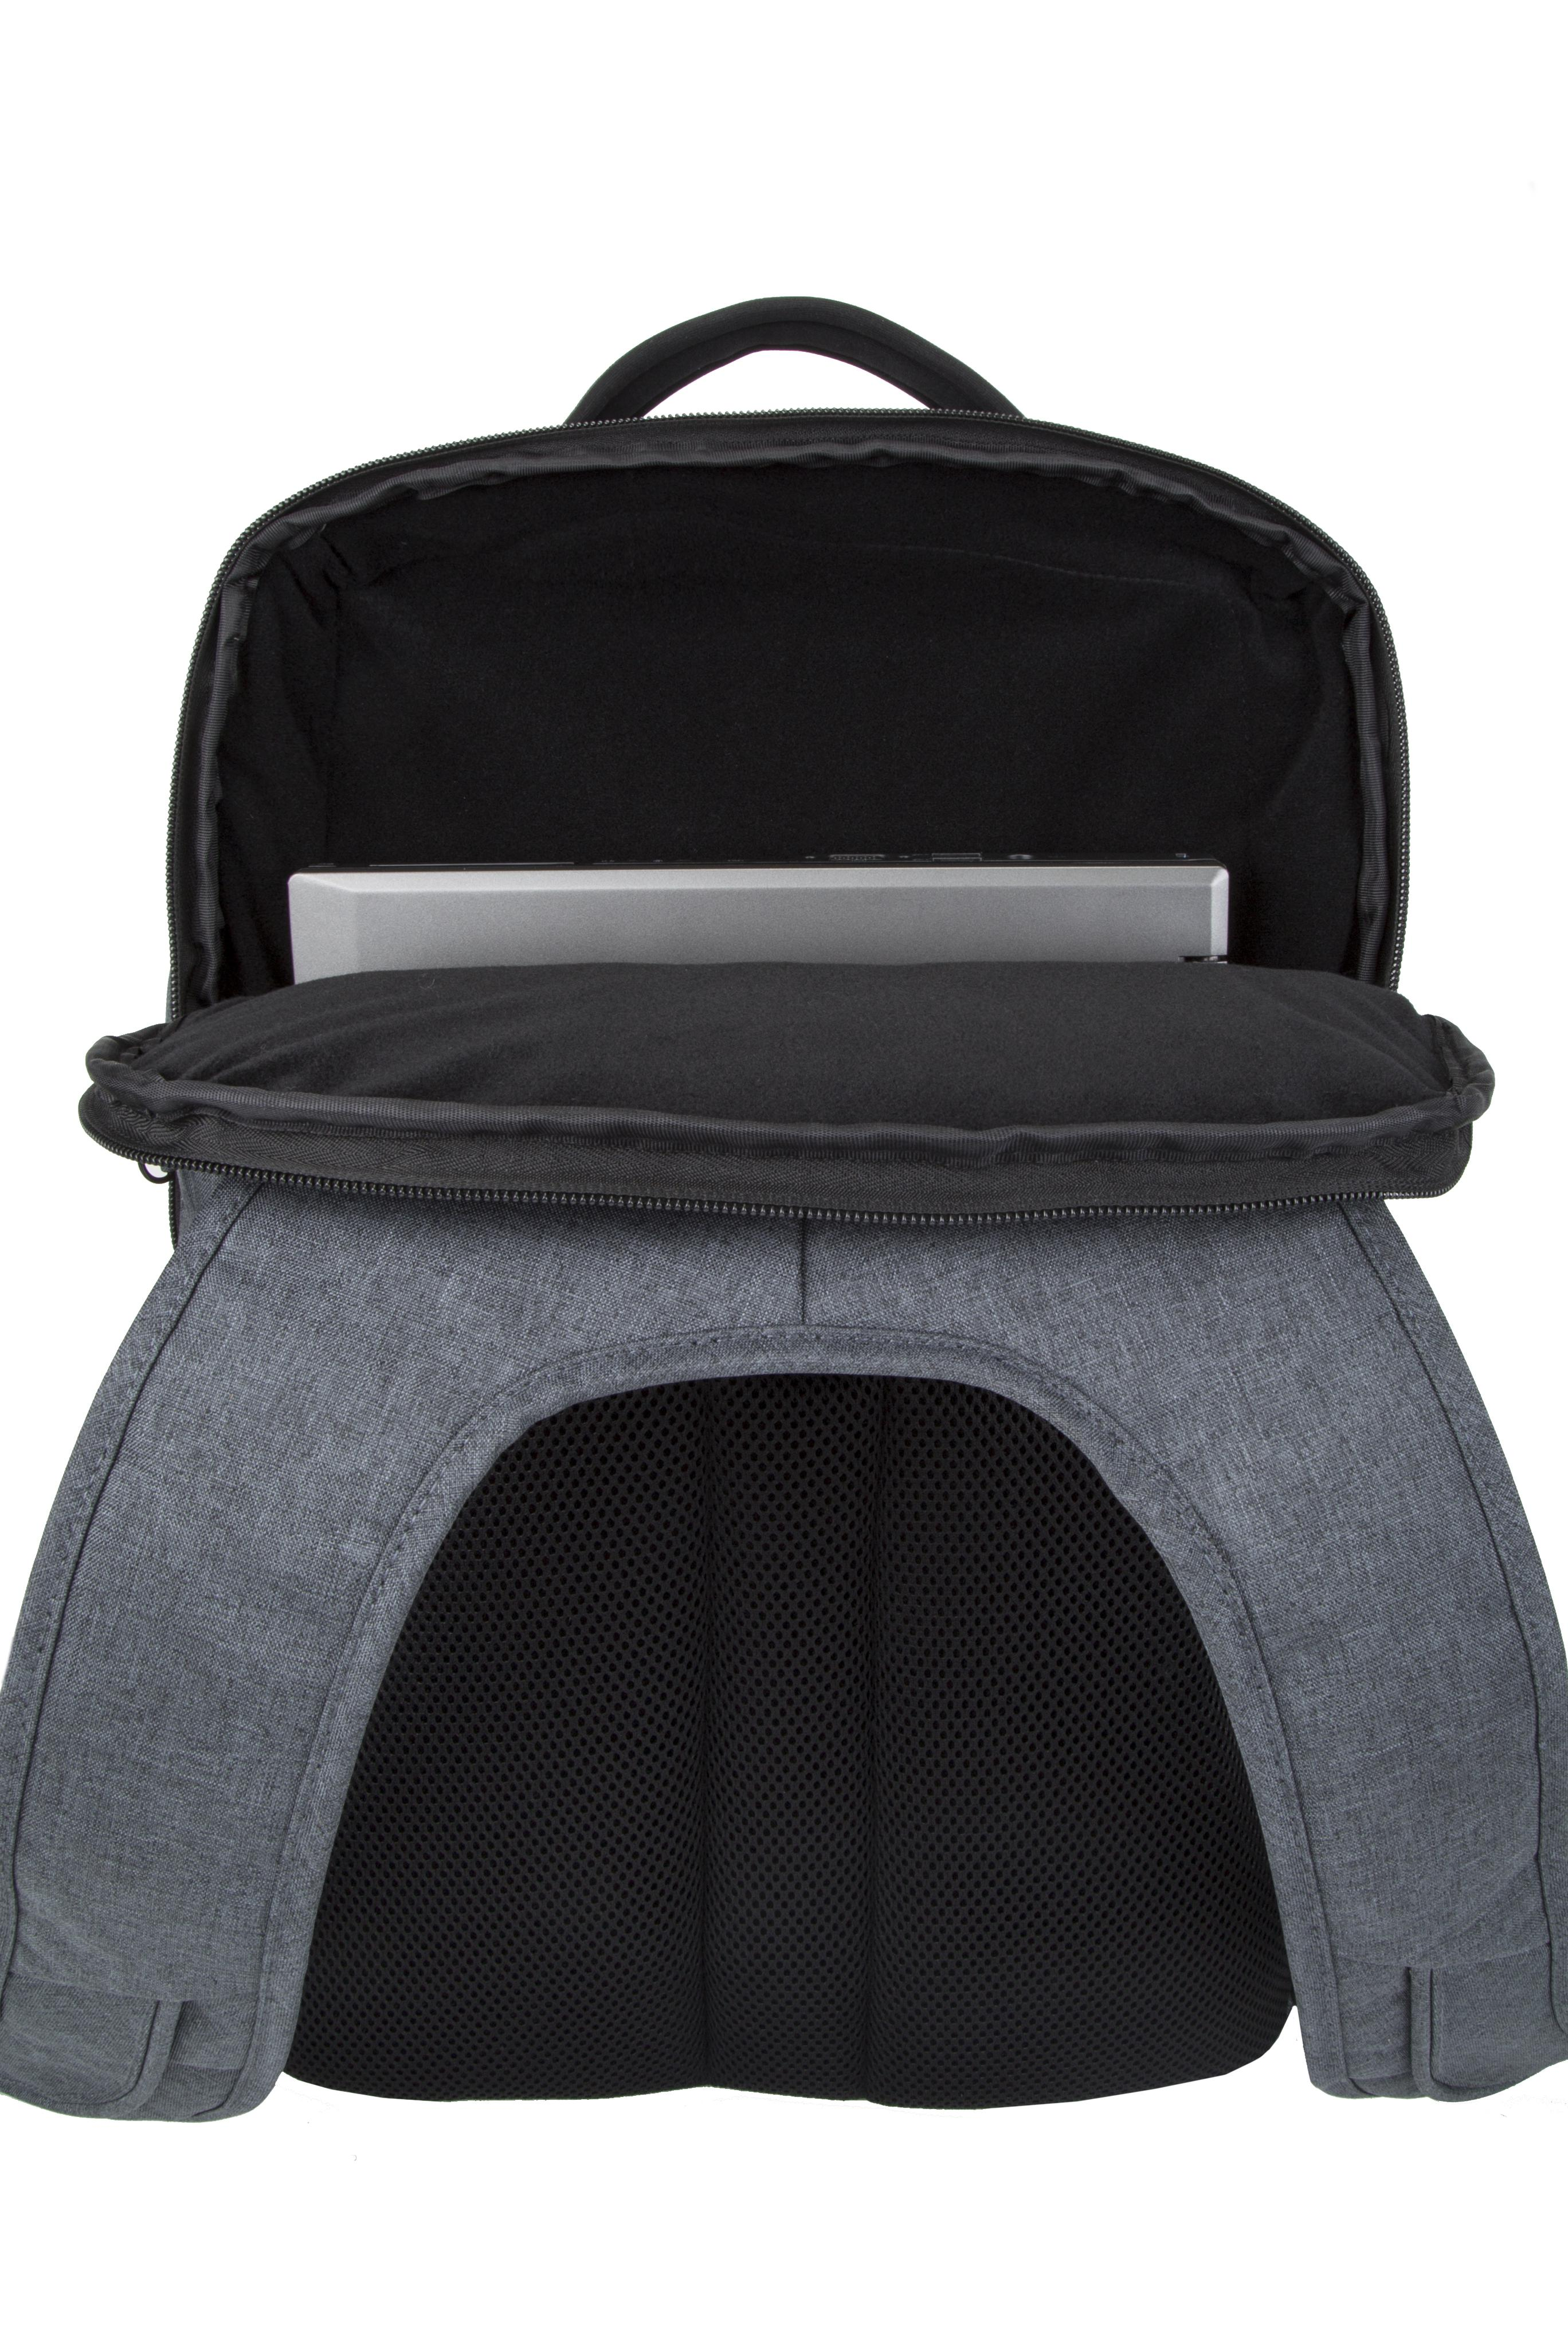 New-Travelon-Men-039-s-Anti-Theft-Urban-Backpack thumbnail 5